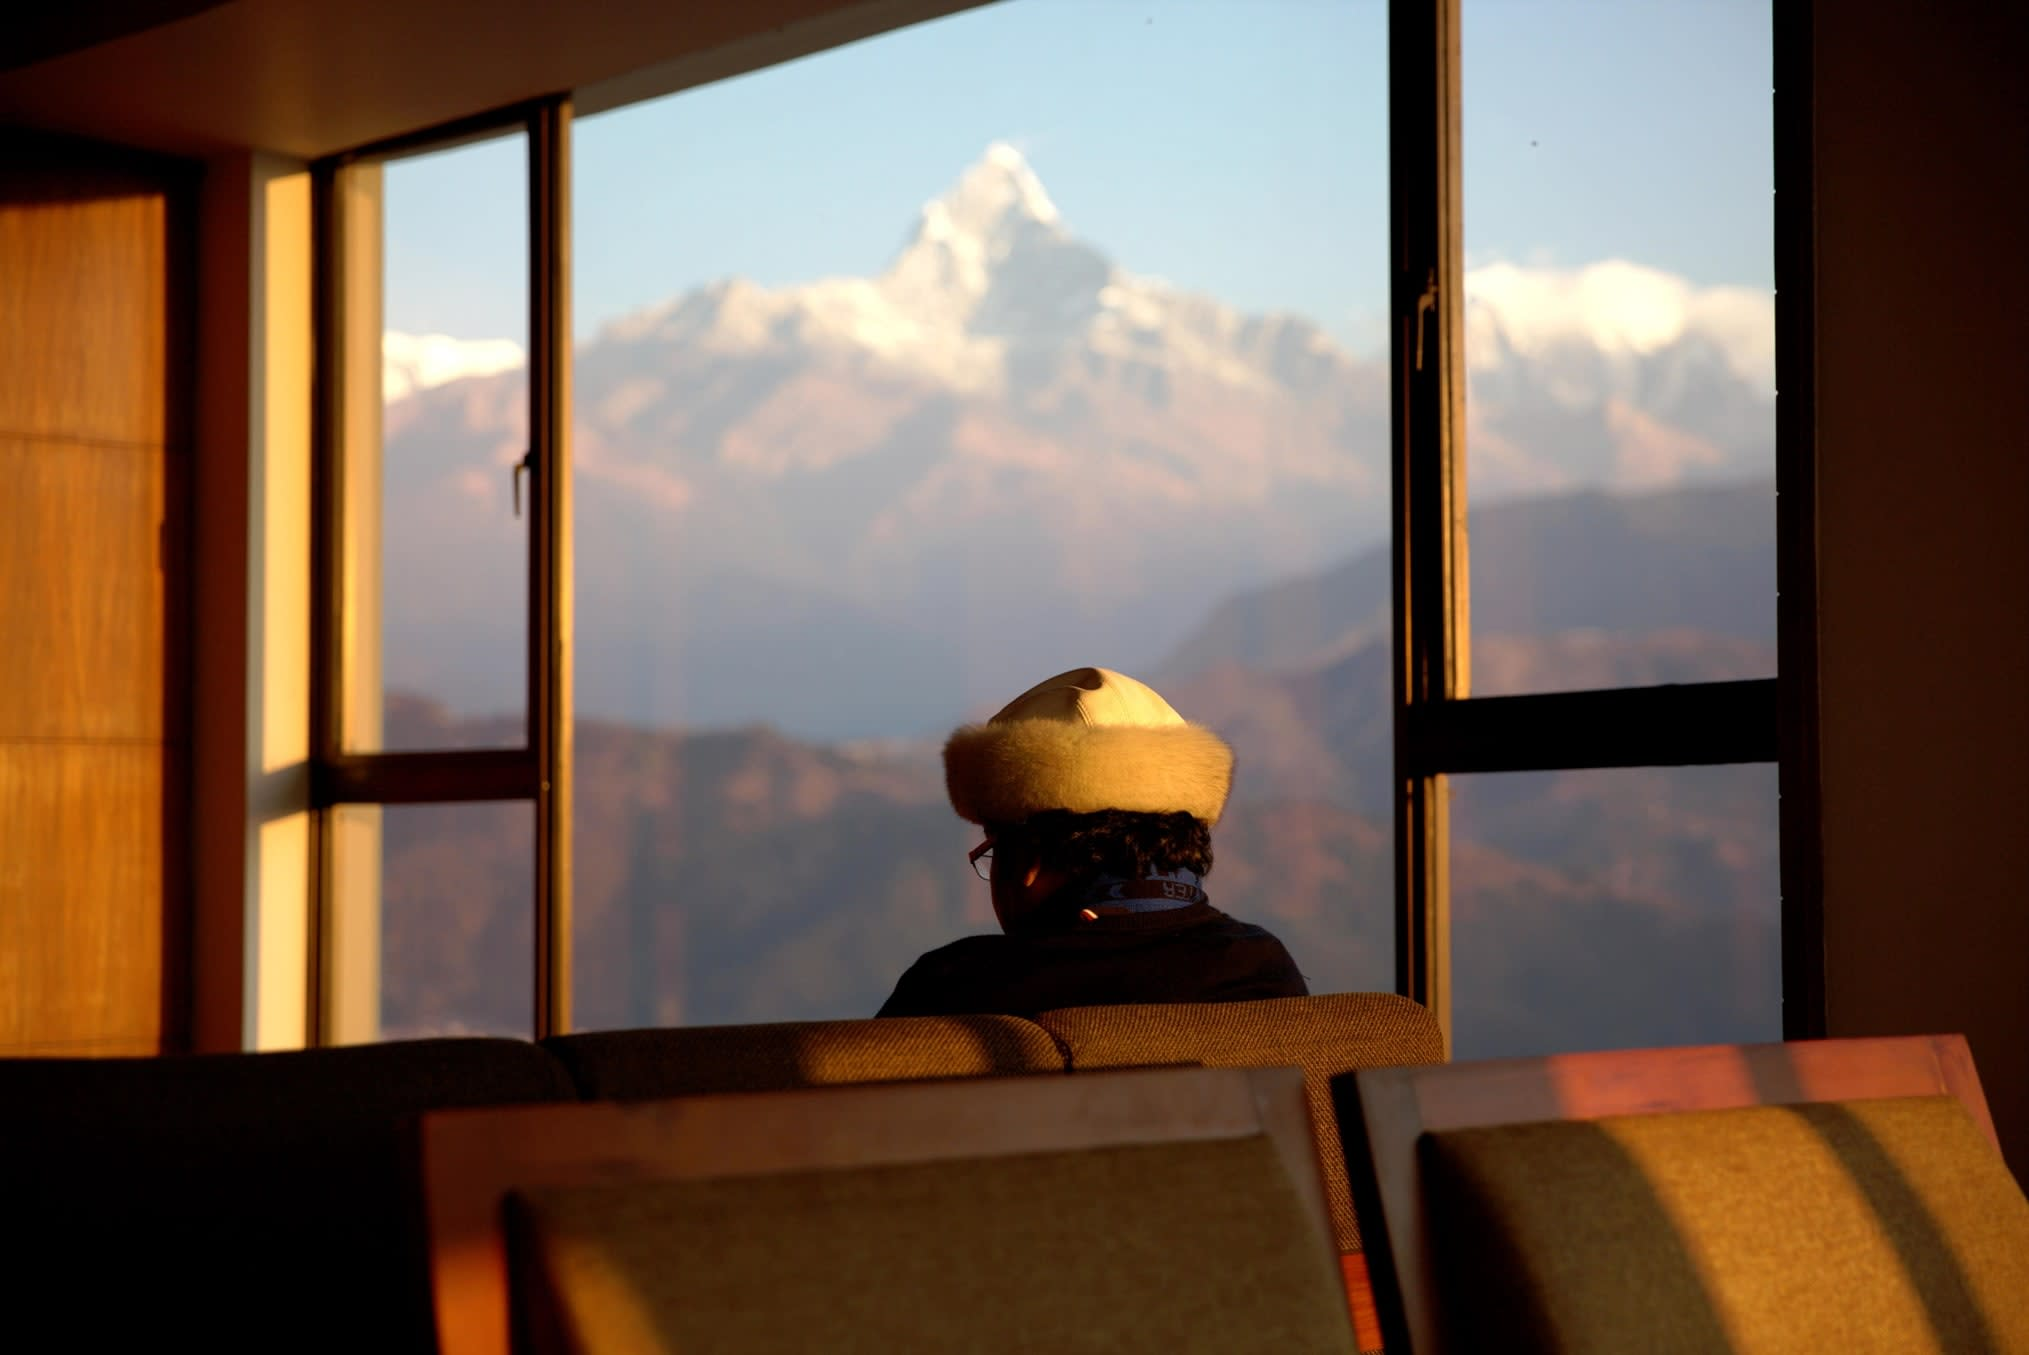 du lịch nepal: cảnh từ himalayan front hotel